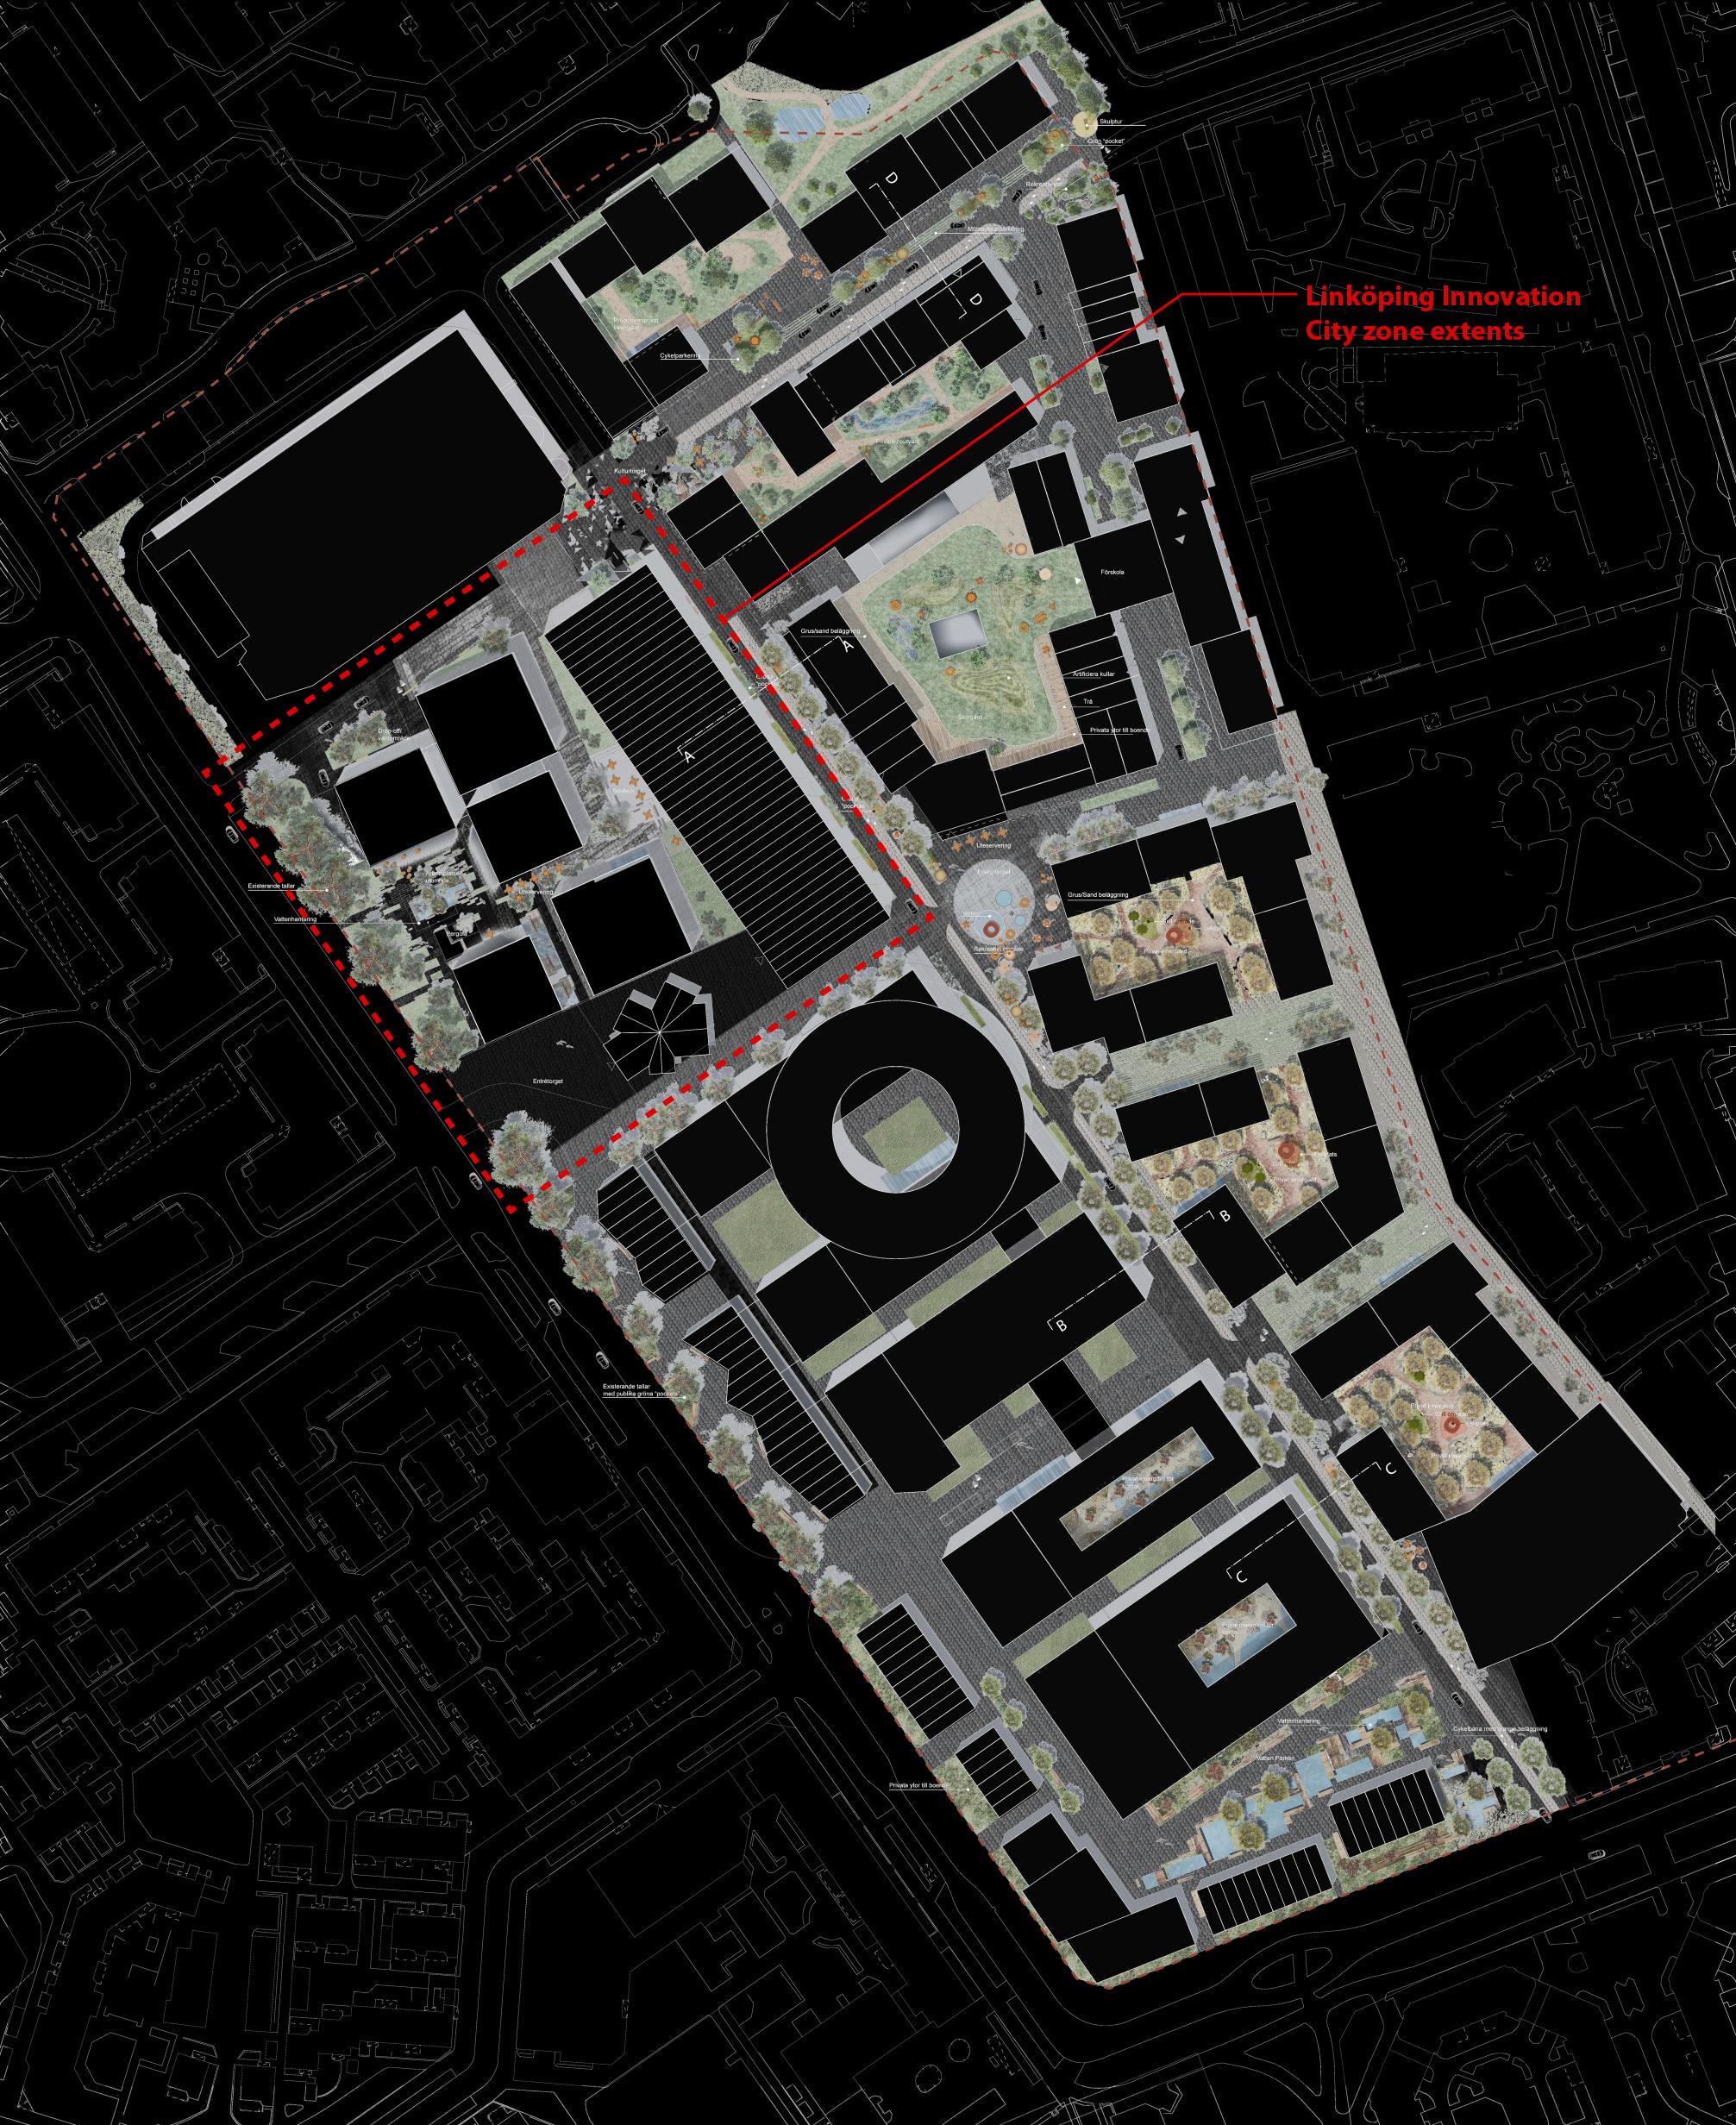 01.urban plan 1 to 500 on A0-EDIT-small.jpg